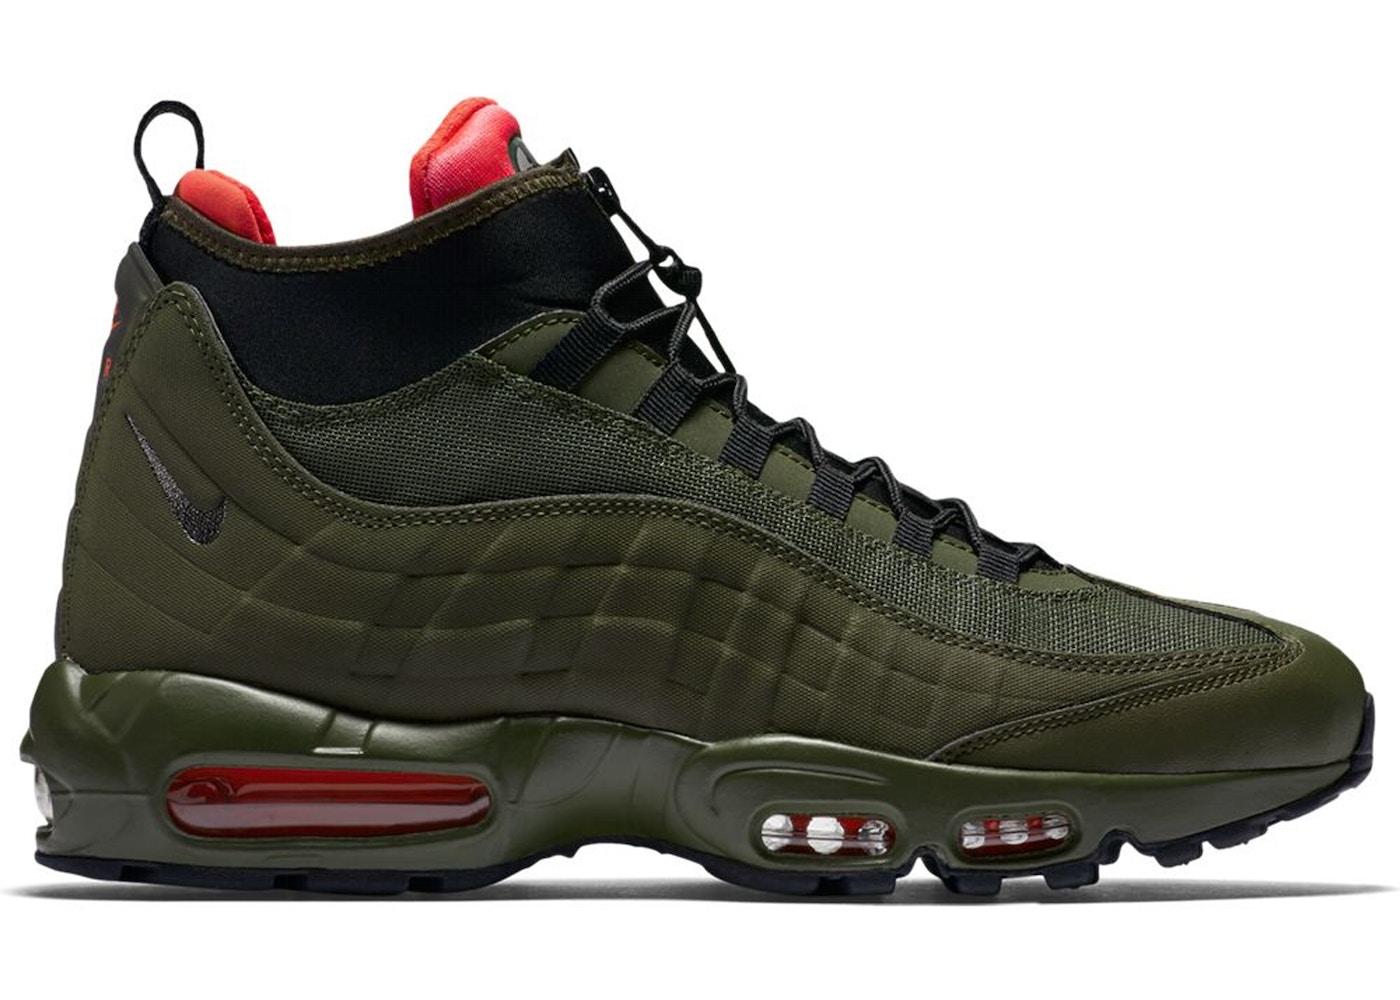 e64a086e2468 Air Max 95 Sneakerboot Dark Loden - 806809-300